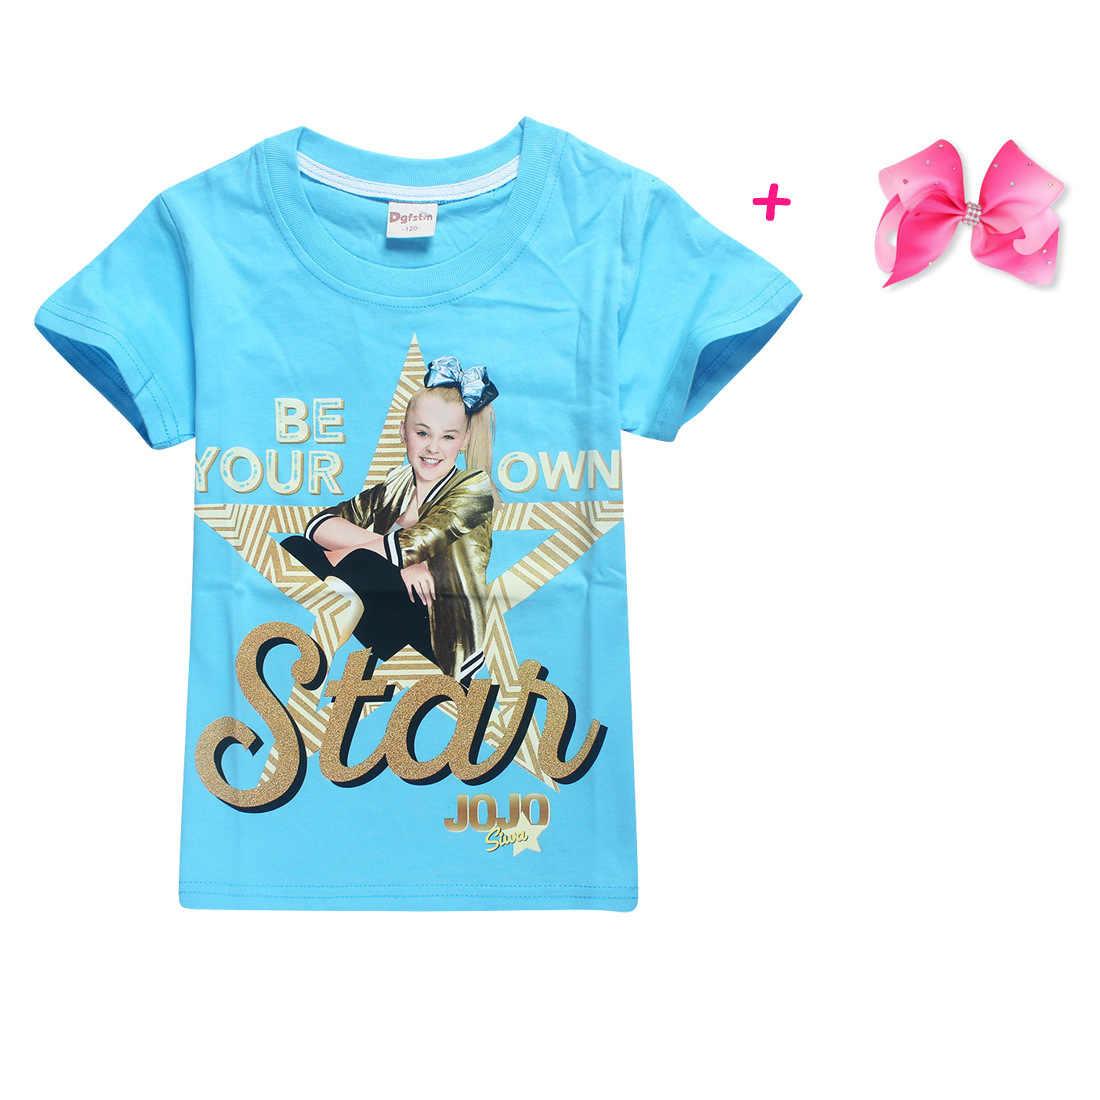 666b1e1e5 ... 100% Cotton T-Shirts for Children 2018 Summer Jojo Siwa Baby Girls Tops  Tees ...